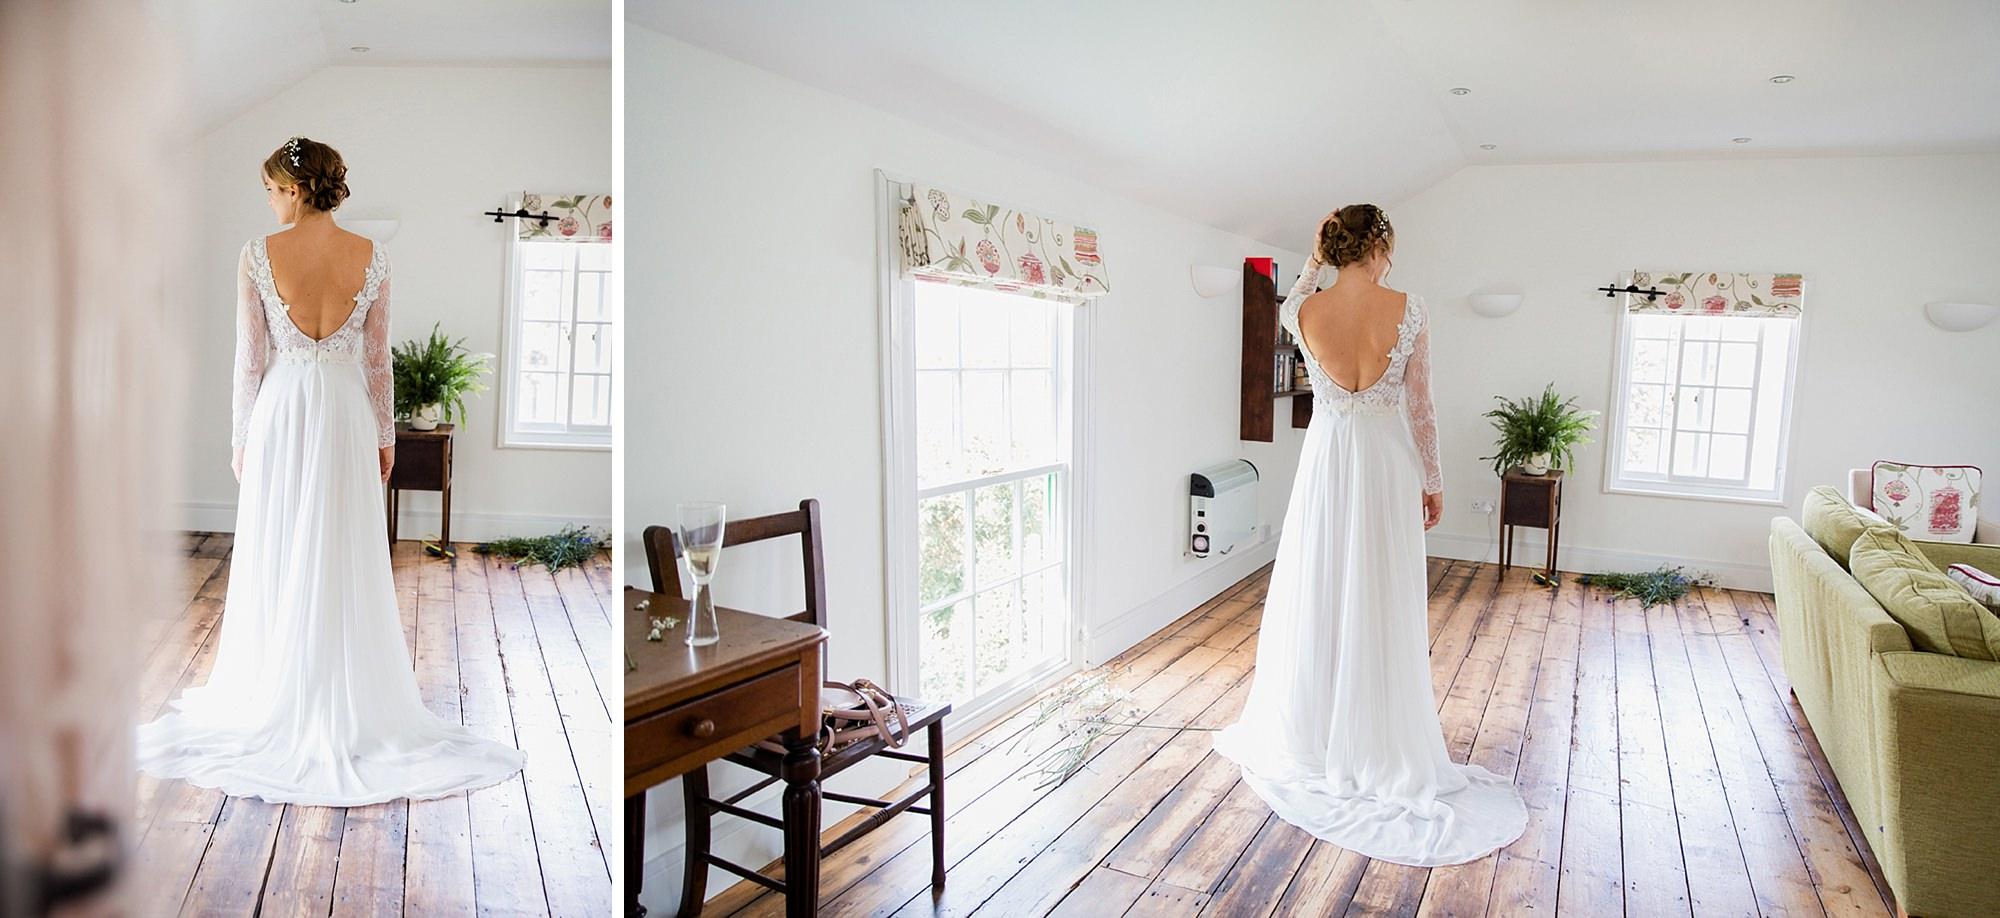 Marks Hall Estate wedding photography bride showing off her dress